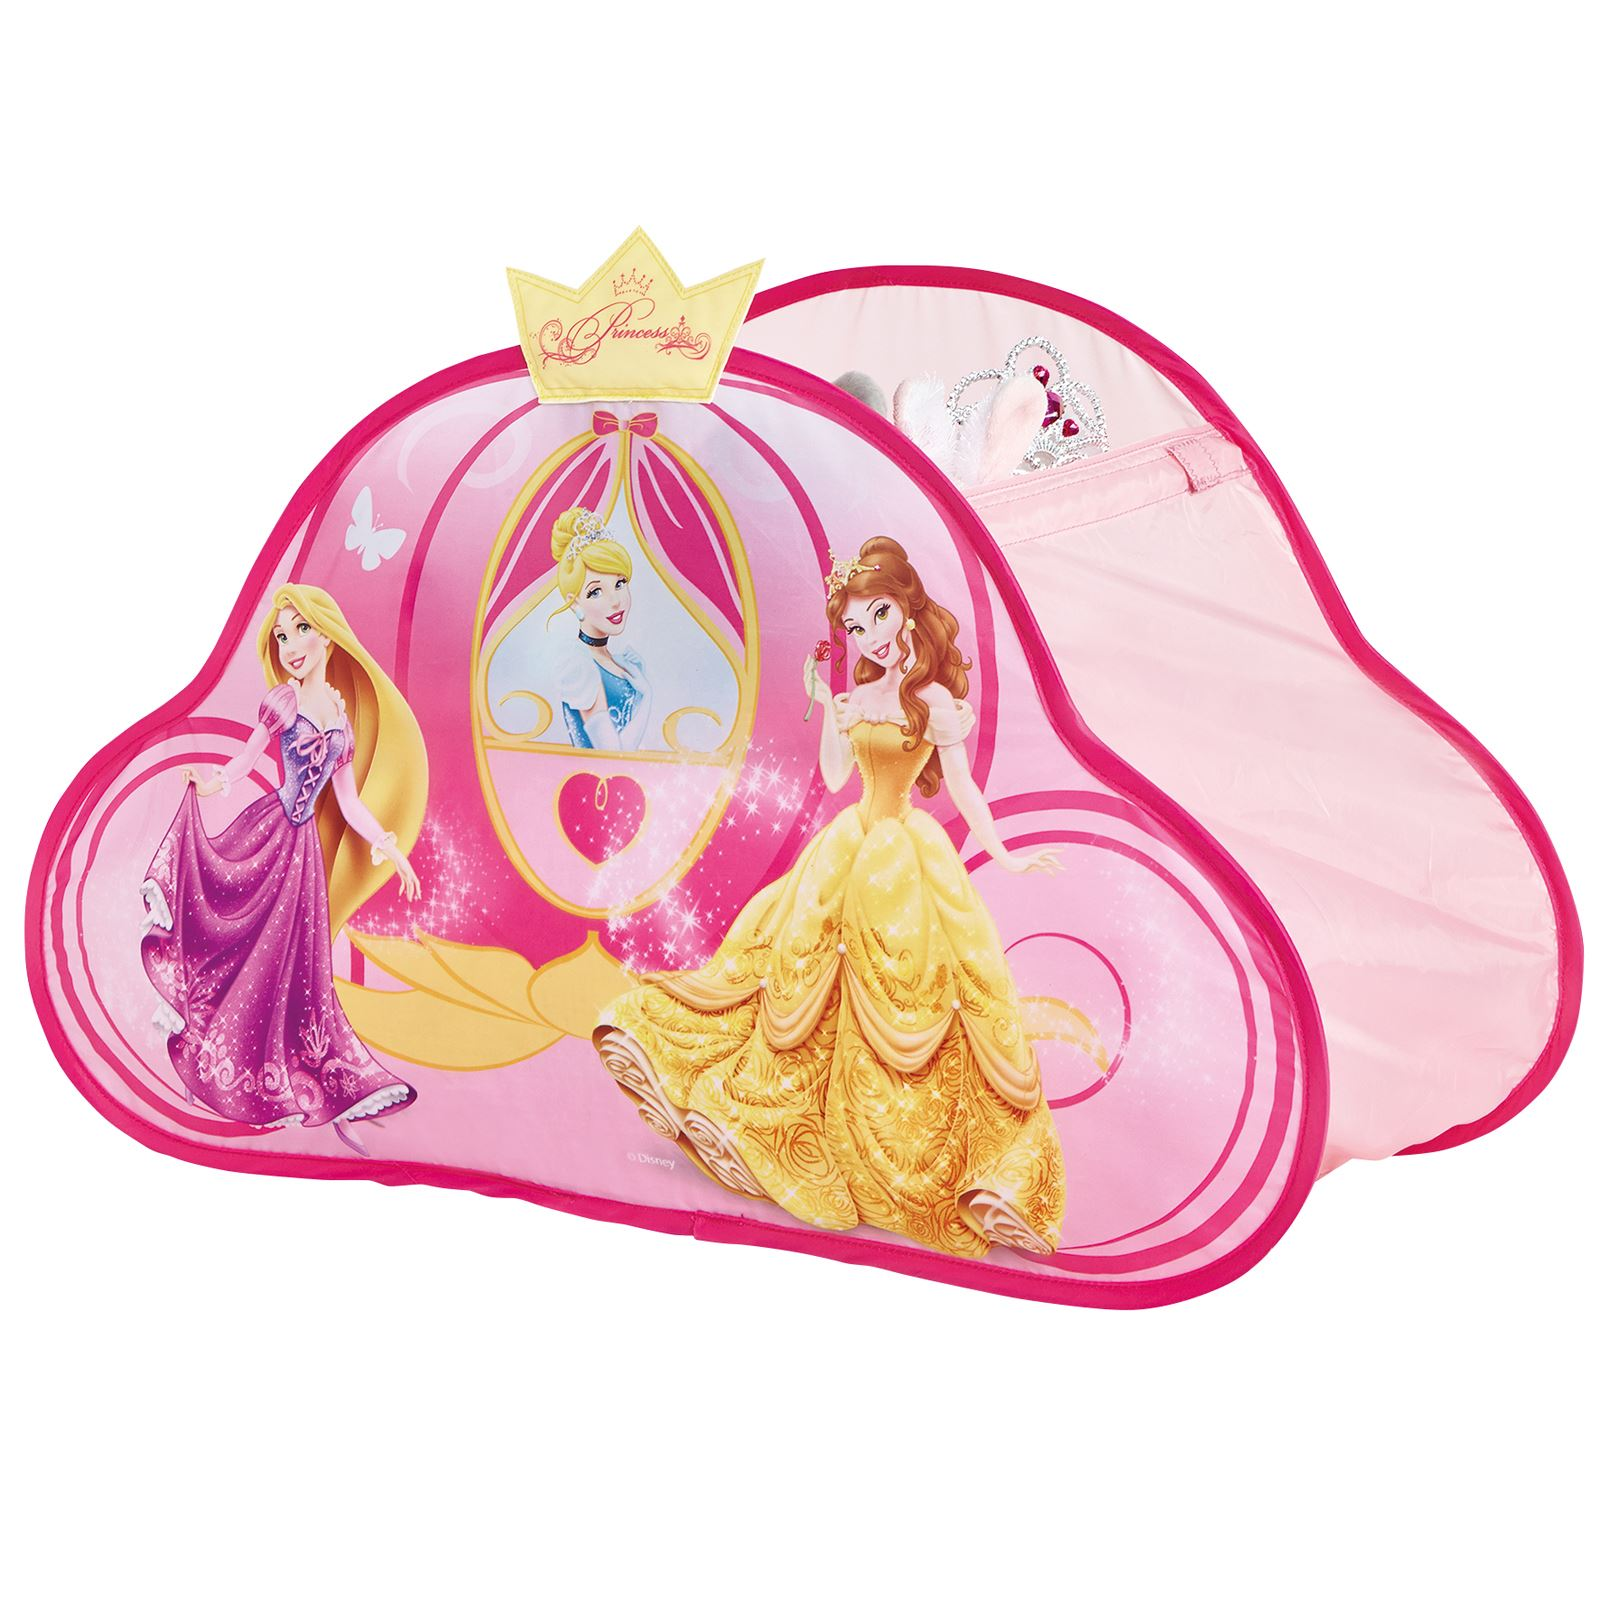 Disney princess pop up meuble de rangement 76x53 cm x 25cm jouets pour enfants eur 24 16 - Meuble de rangement princesse ...